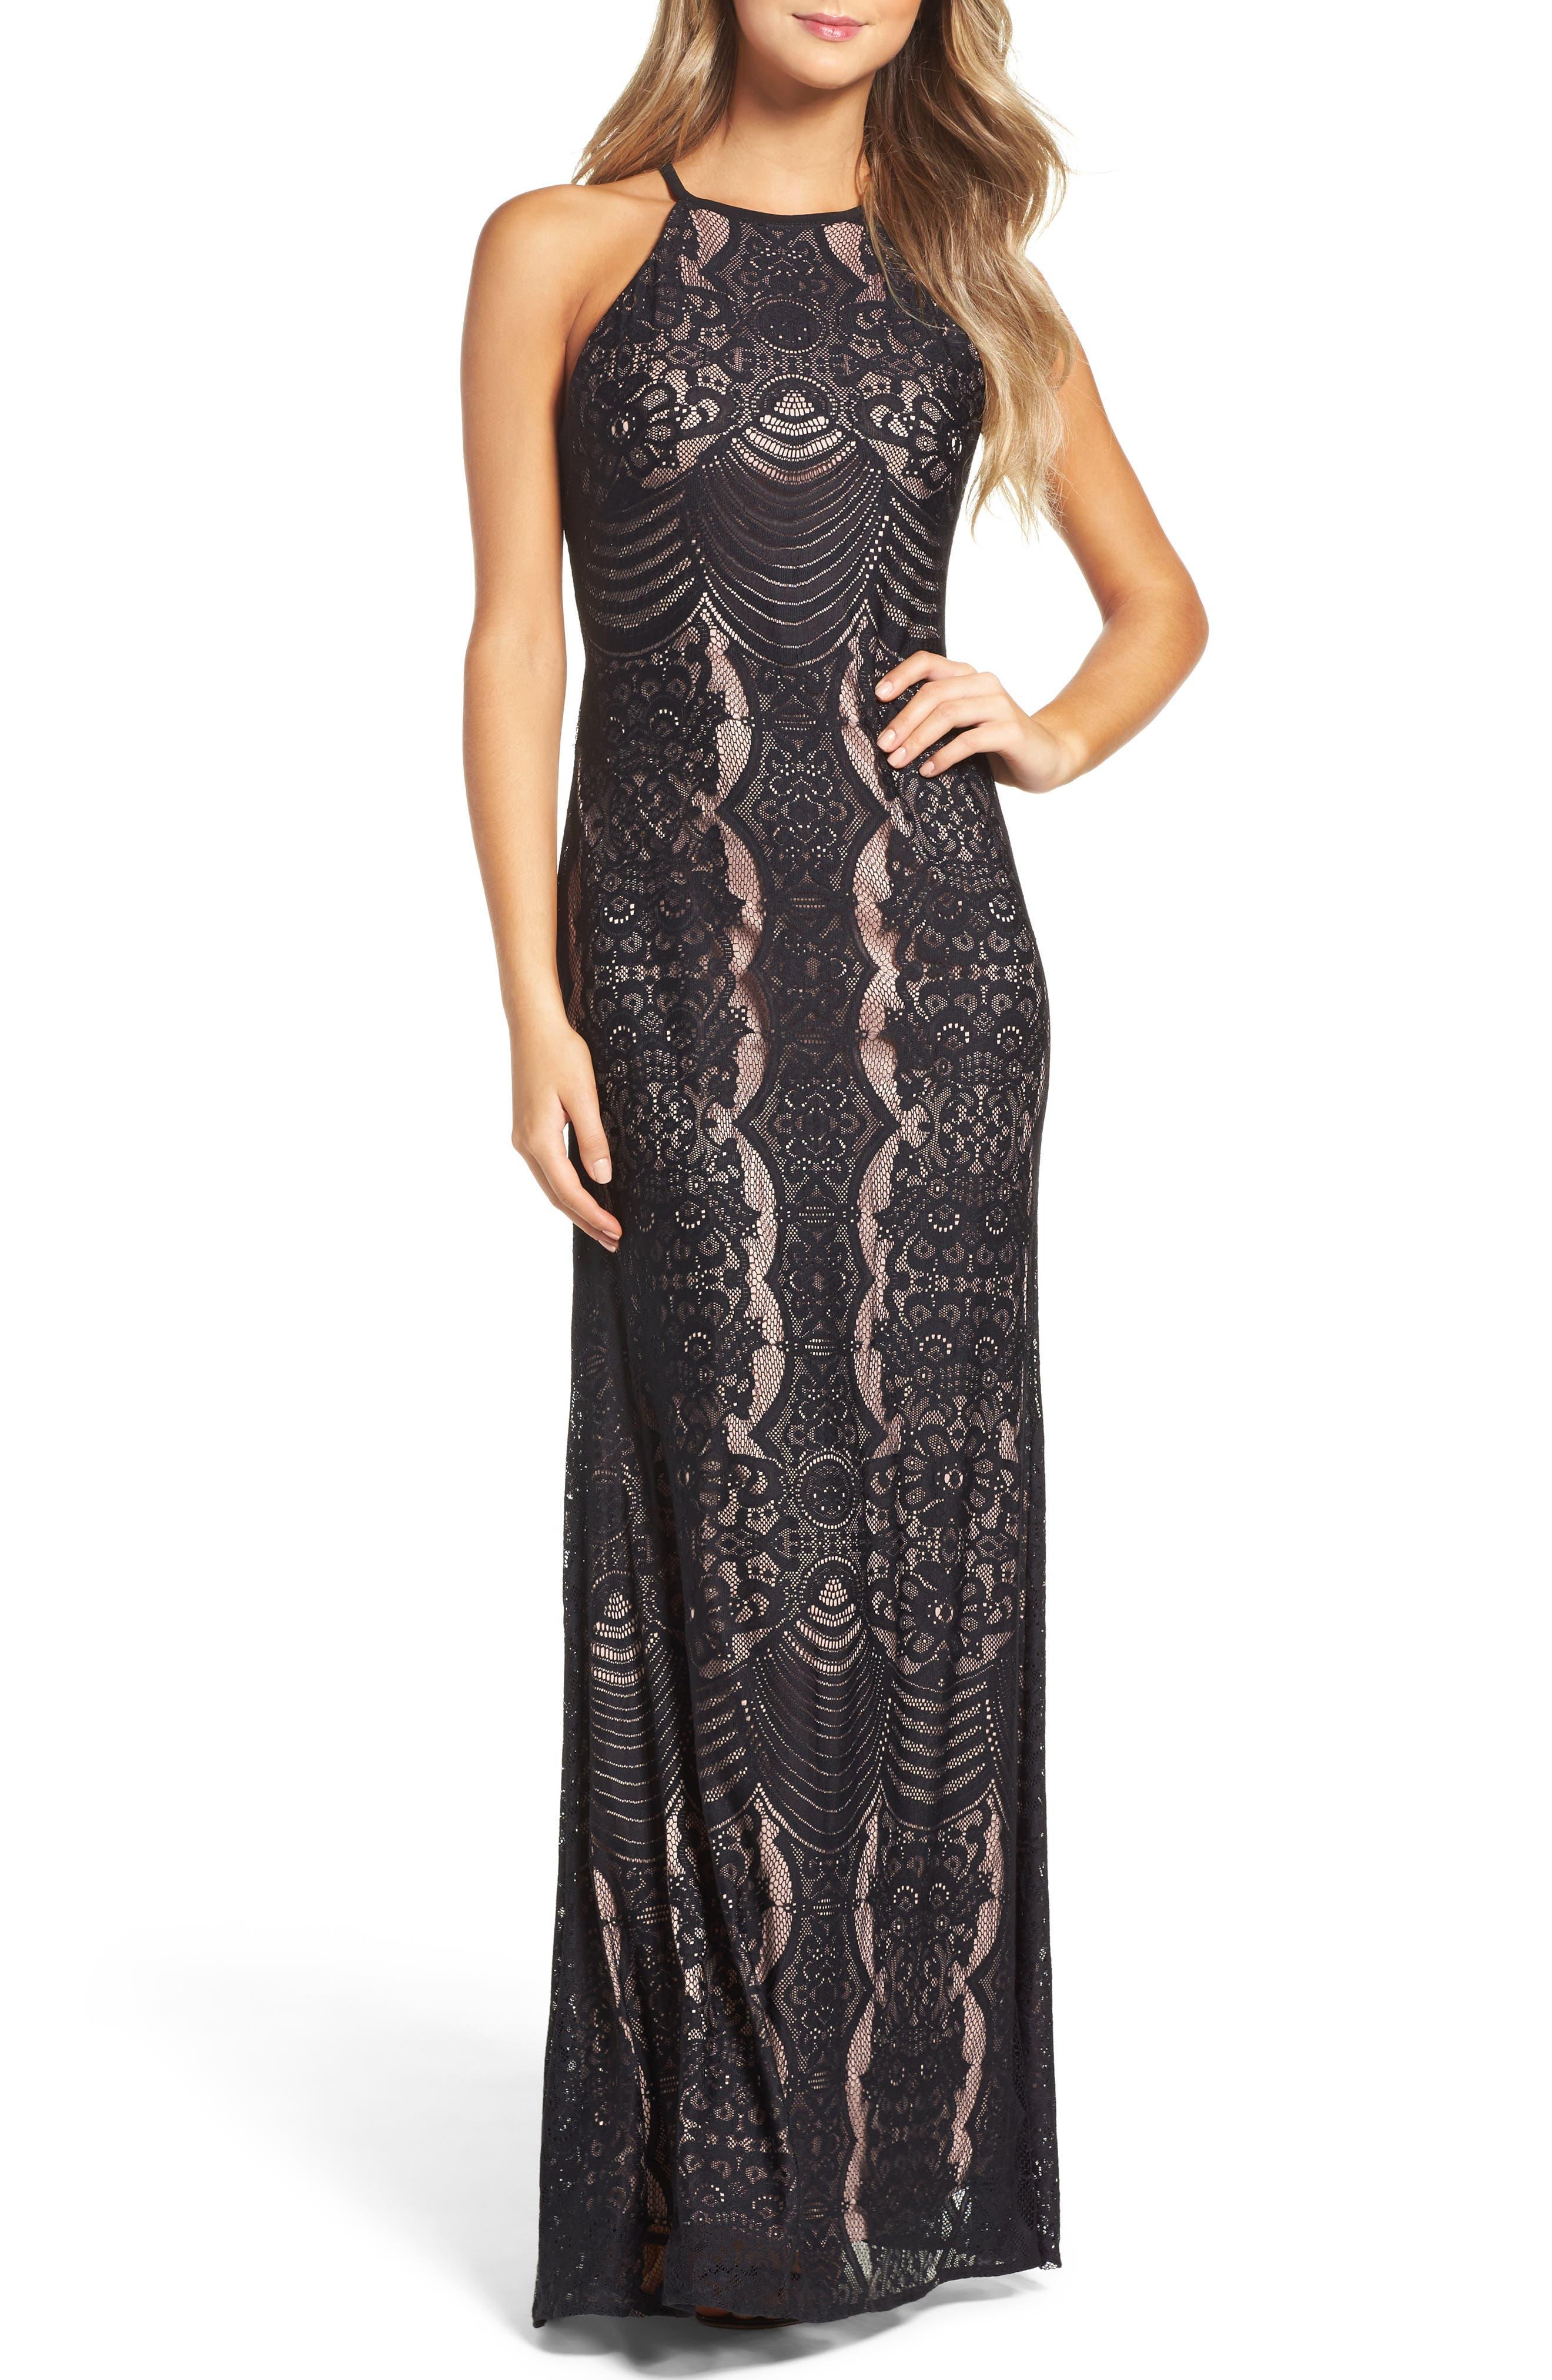 MORGAN & CO. Lace Halter Gown, Main, color, BLACK/ NUDE